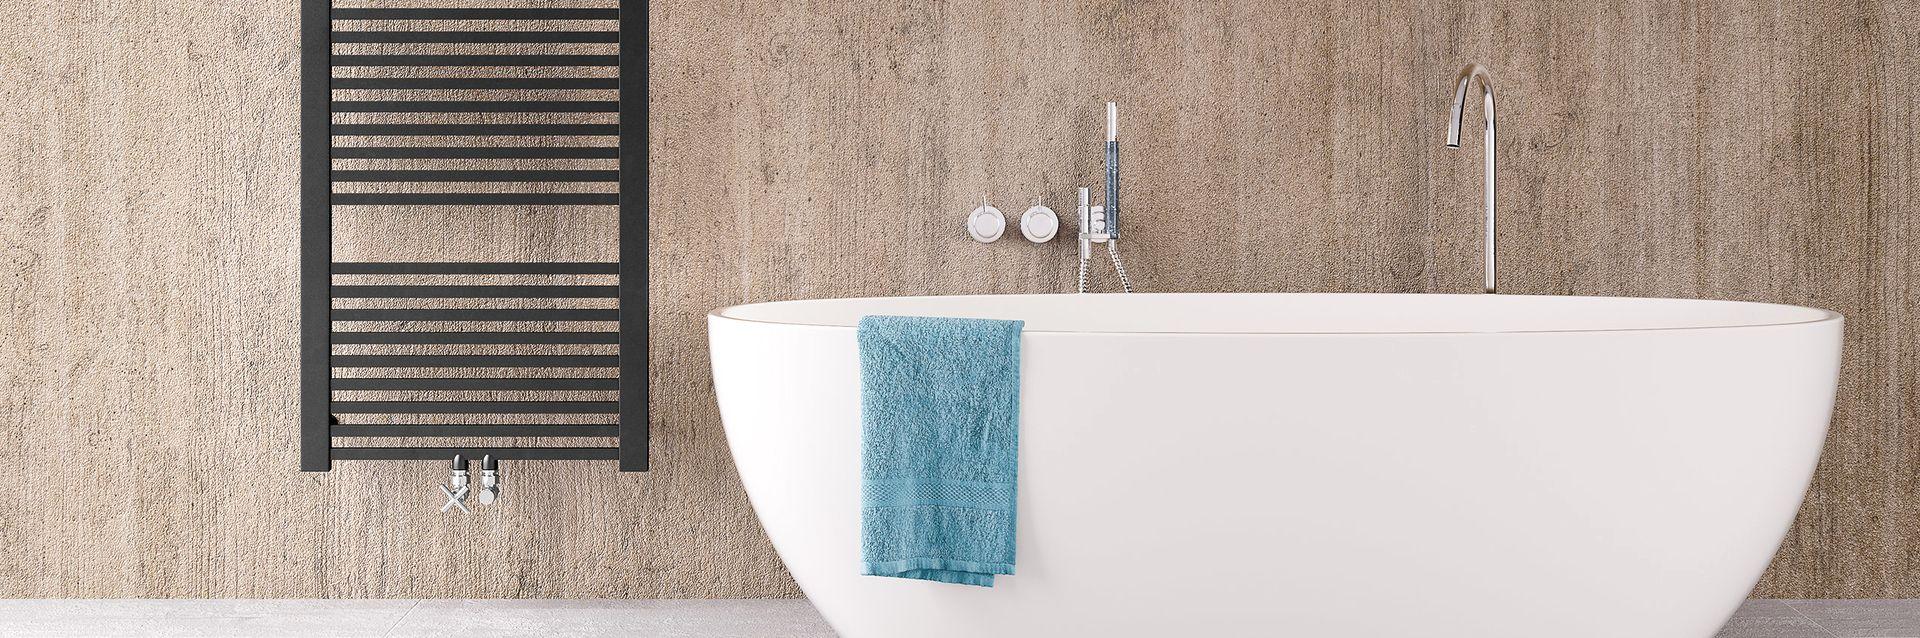 Verwarming in de badkamer - Verwarming in de badkamer